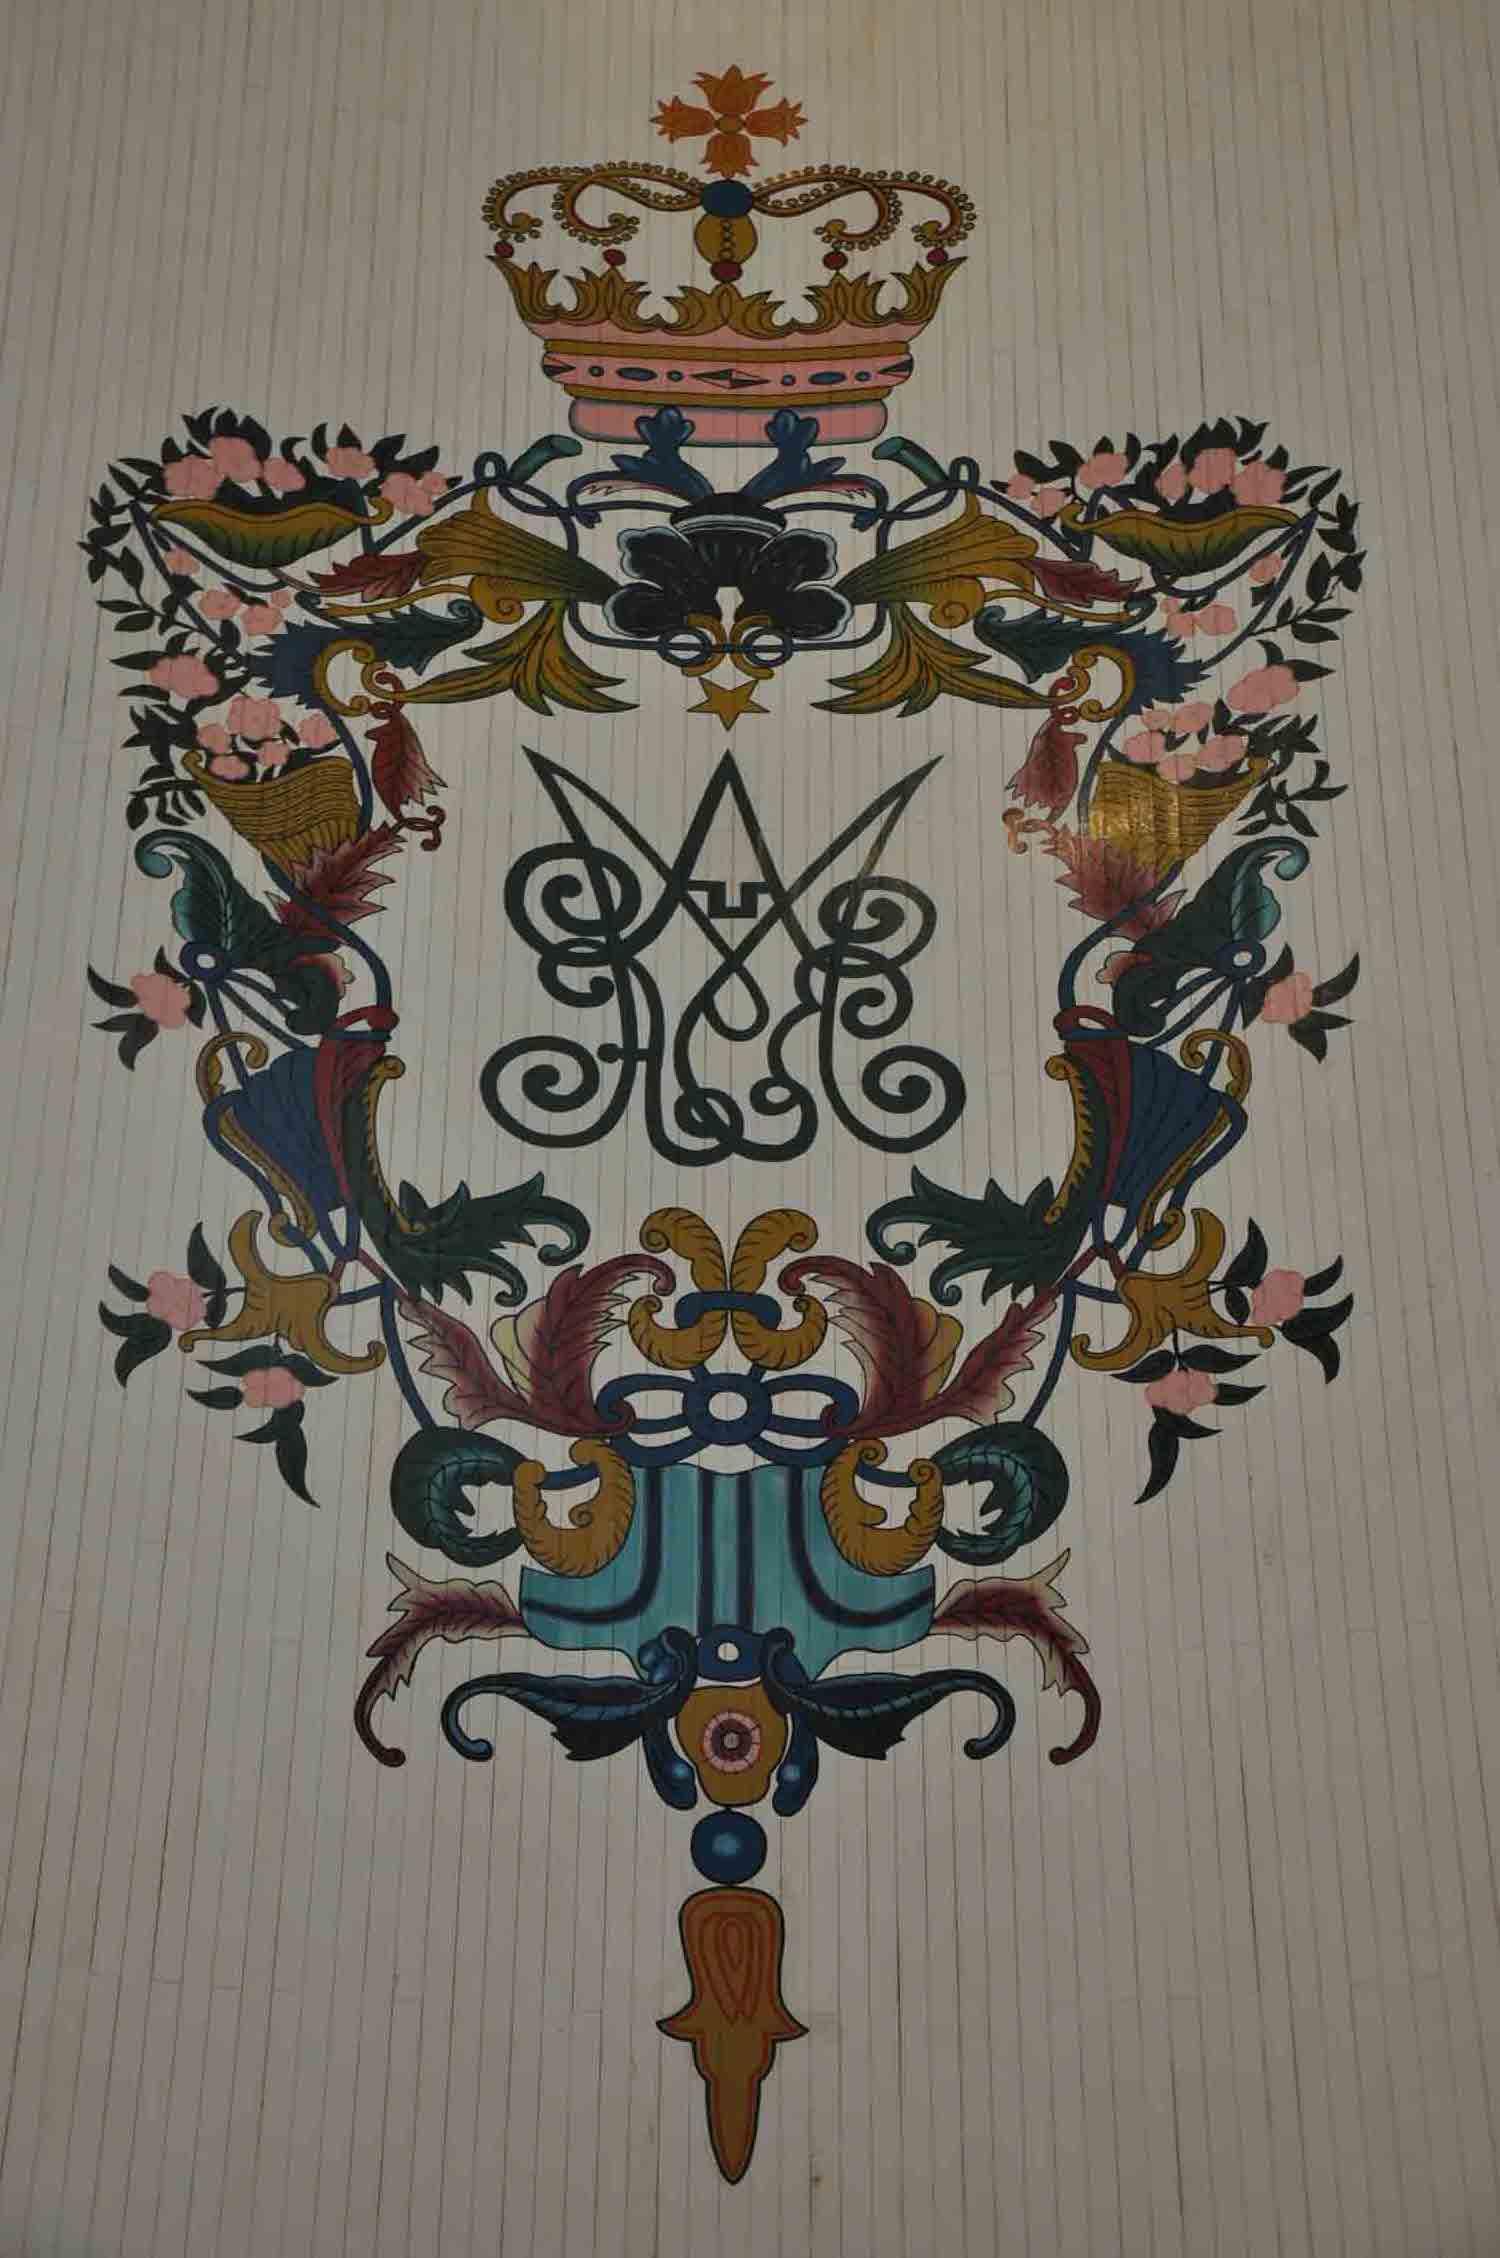 St. Dominics Church Macau ceiling symbol with crown